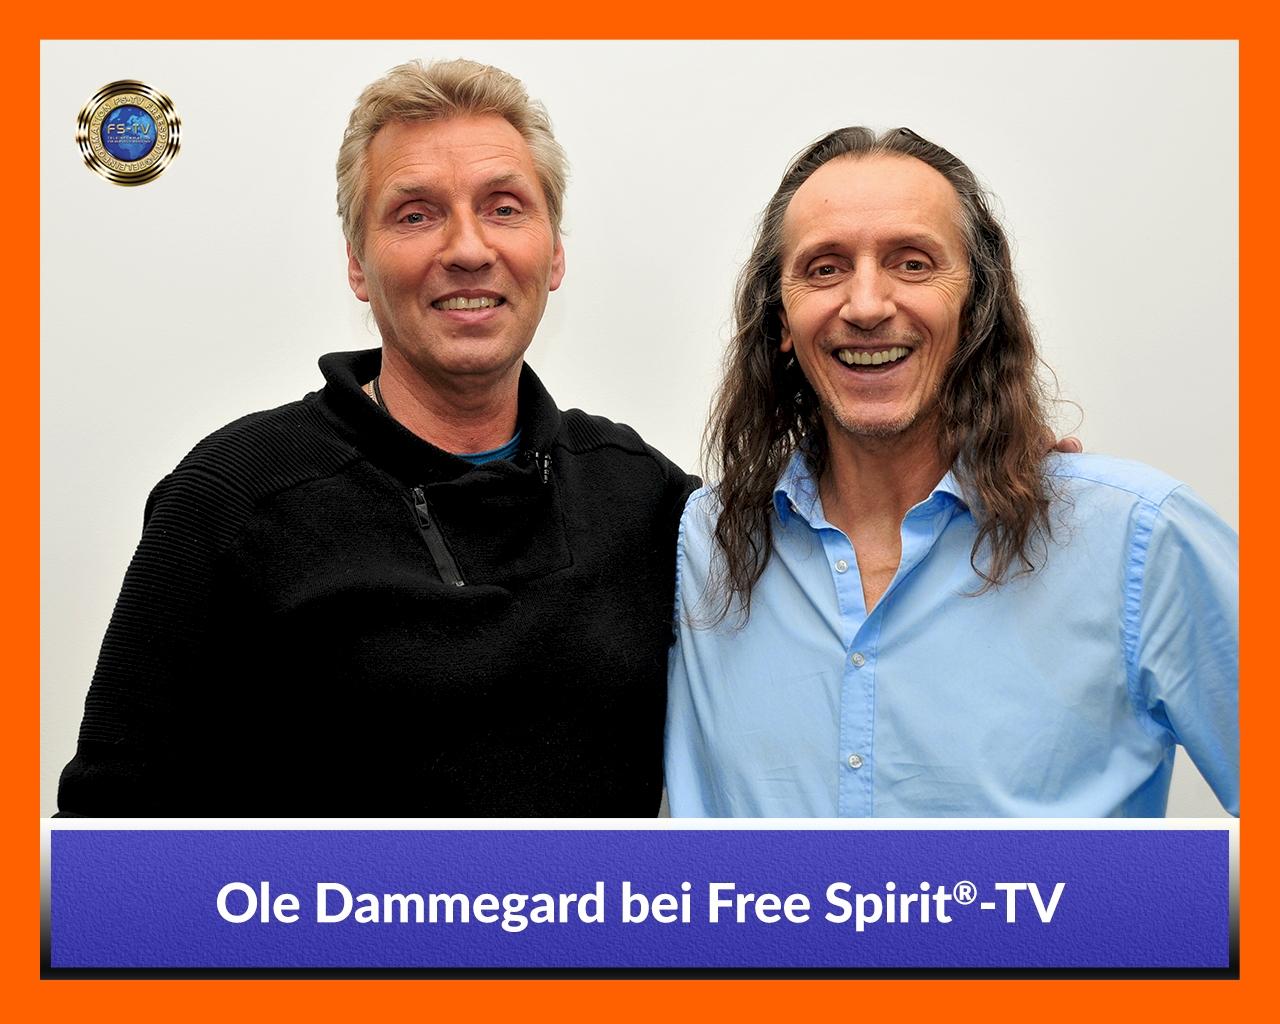 Galleriebild-Ole-Dammegard-6